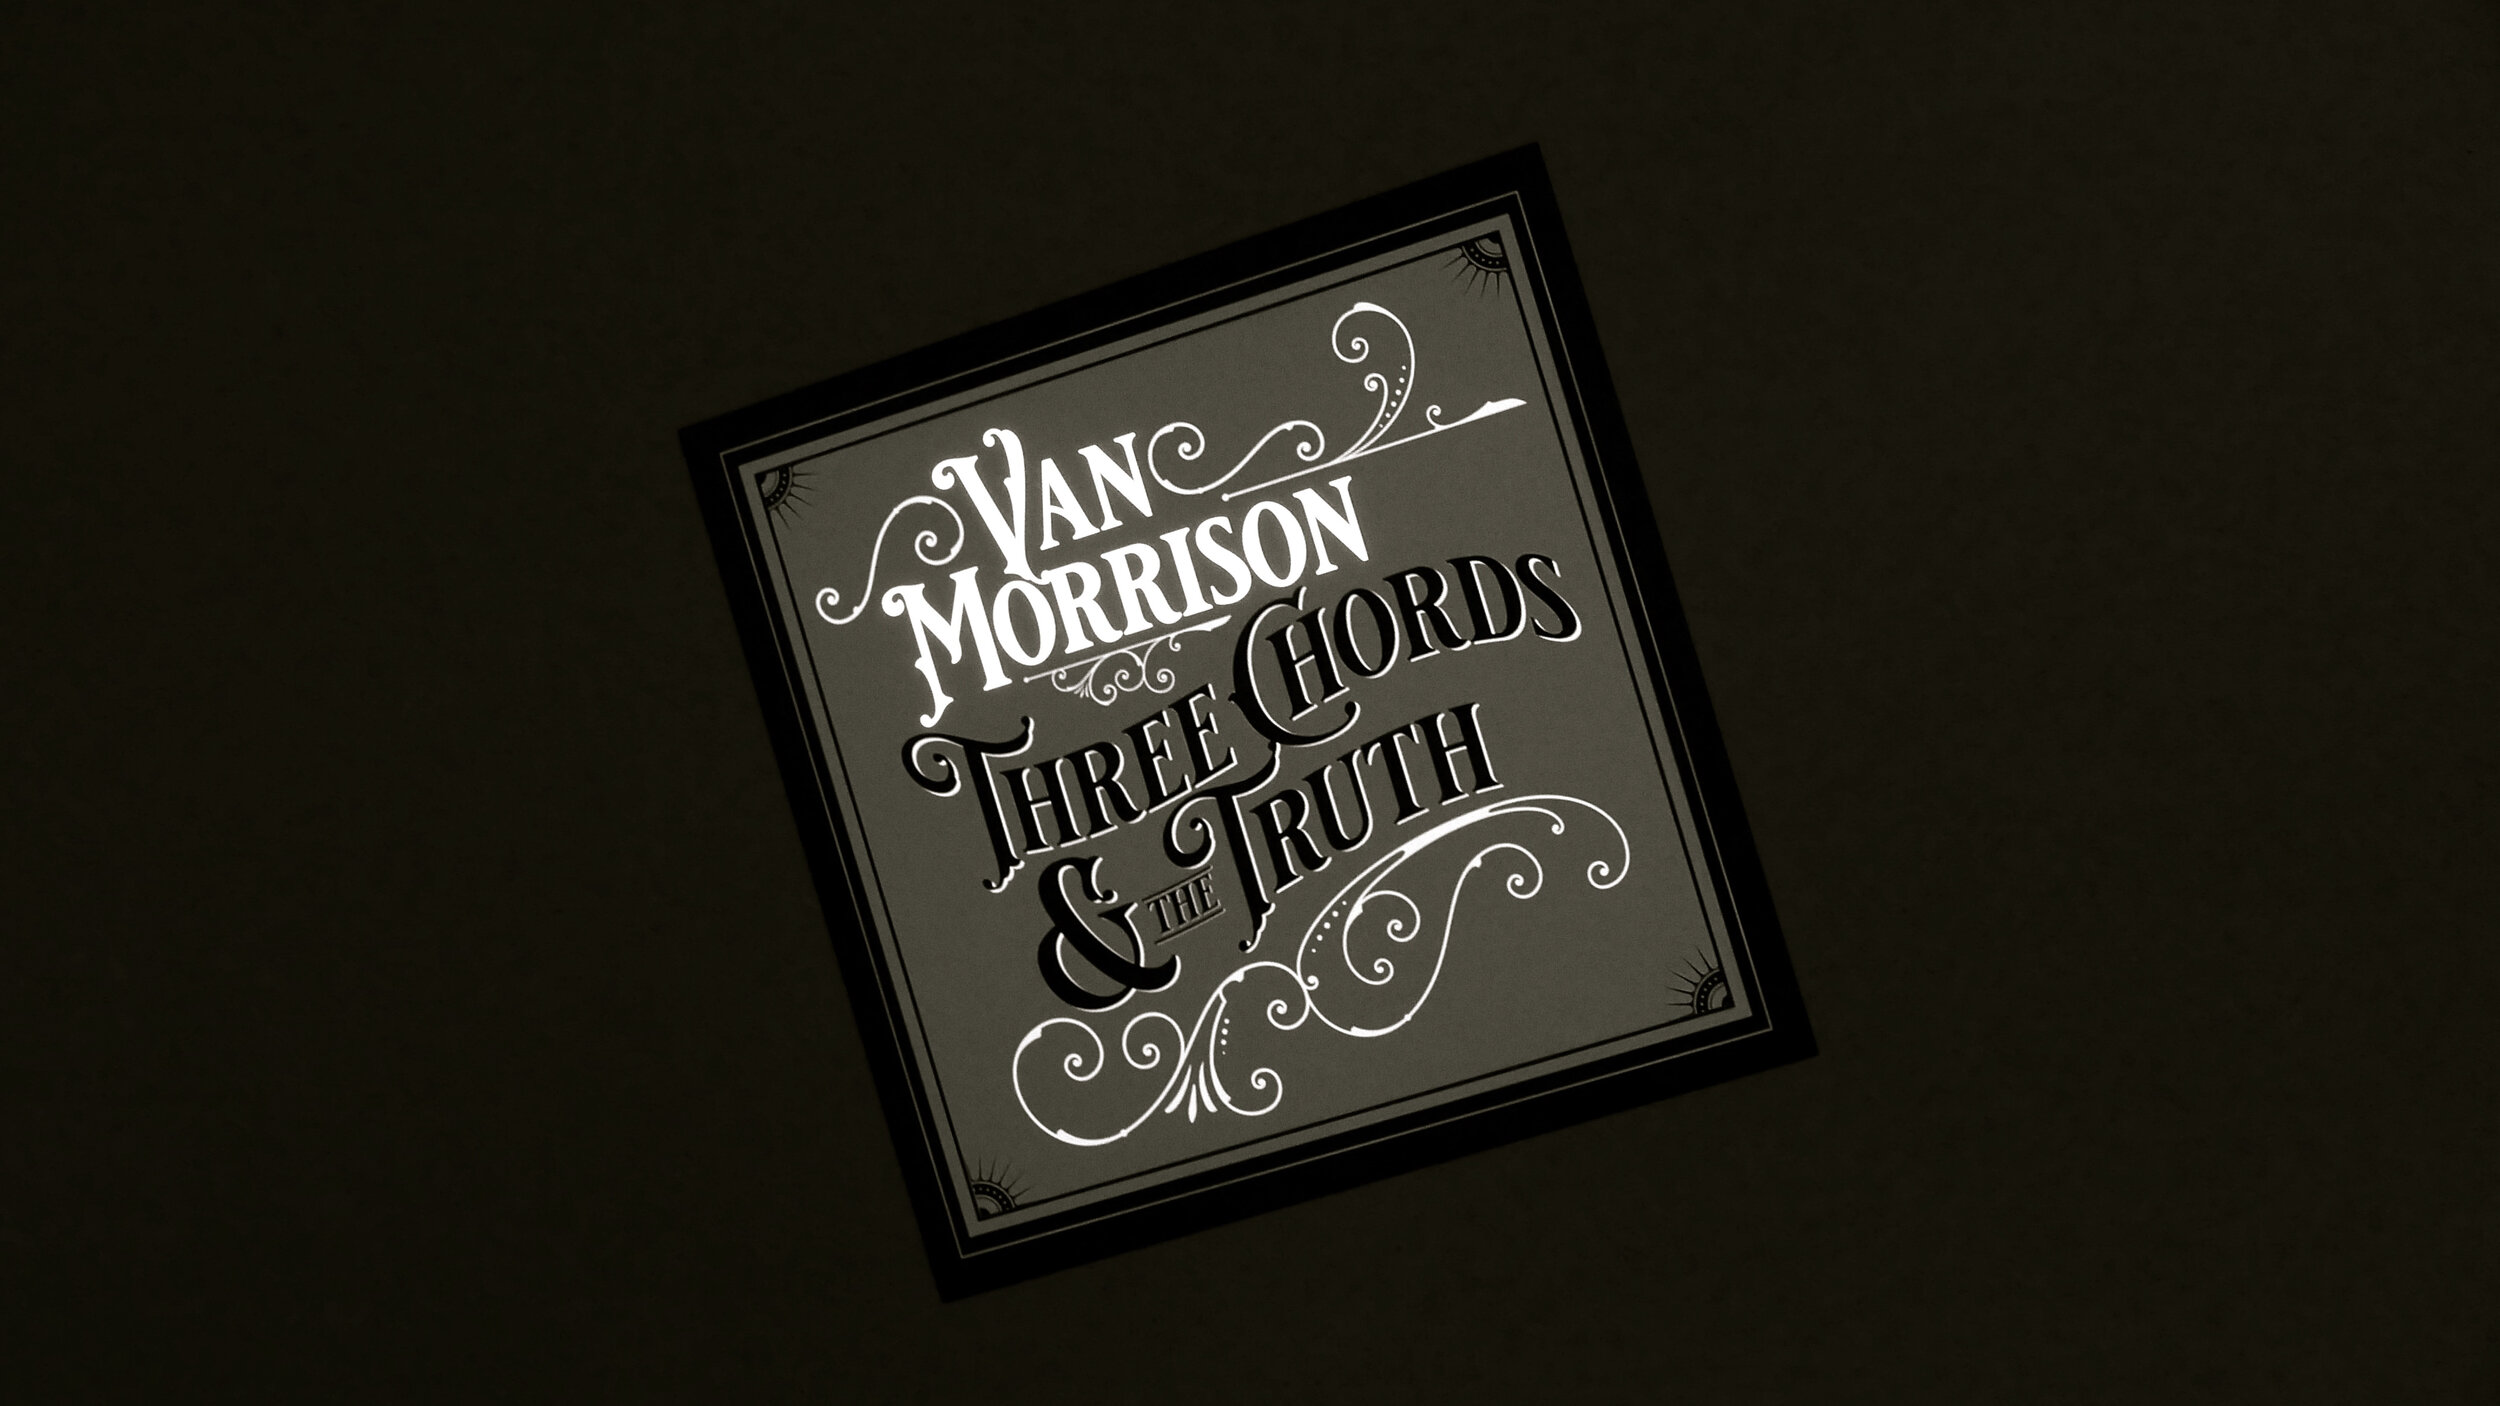 Van Morrison Three Chords & Truth